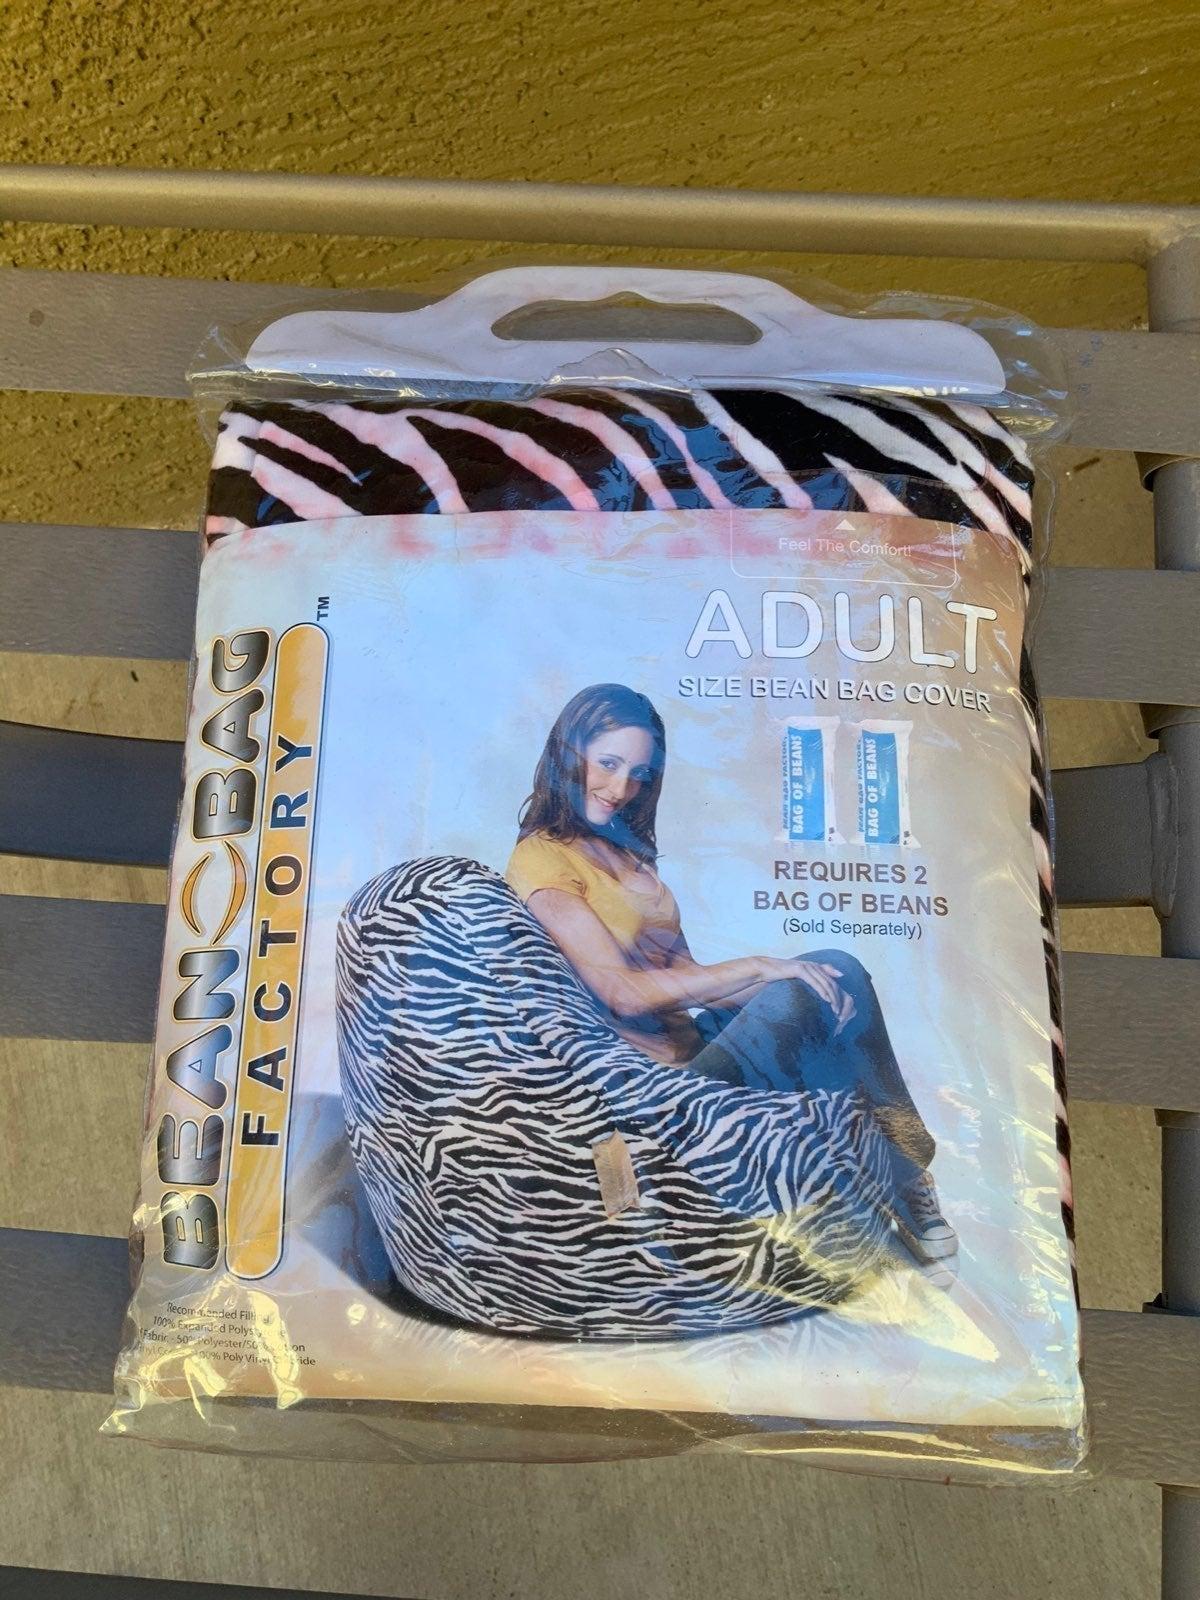 Adult Bean Bag Cover